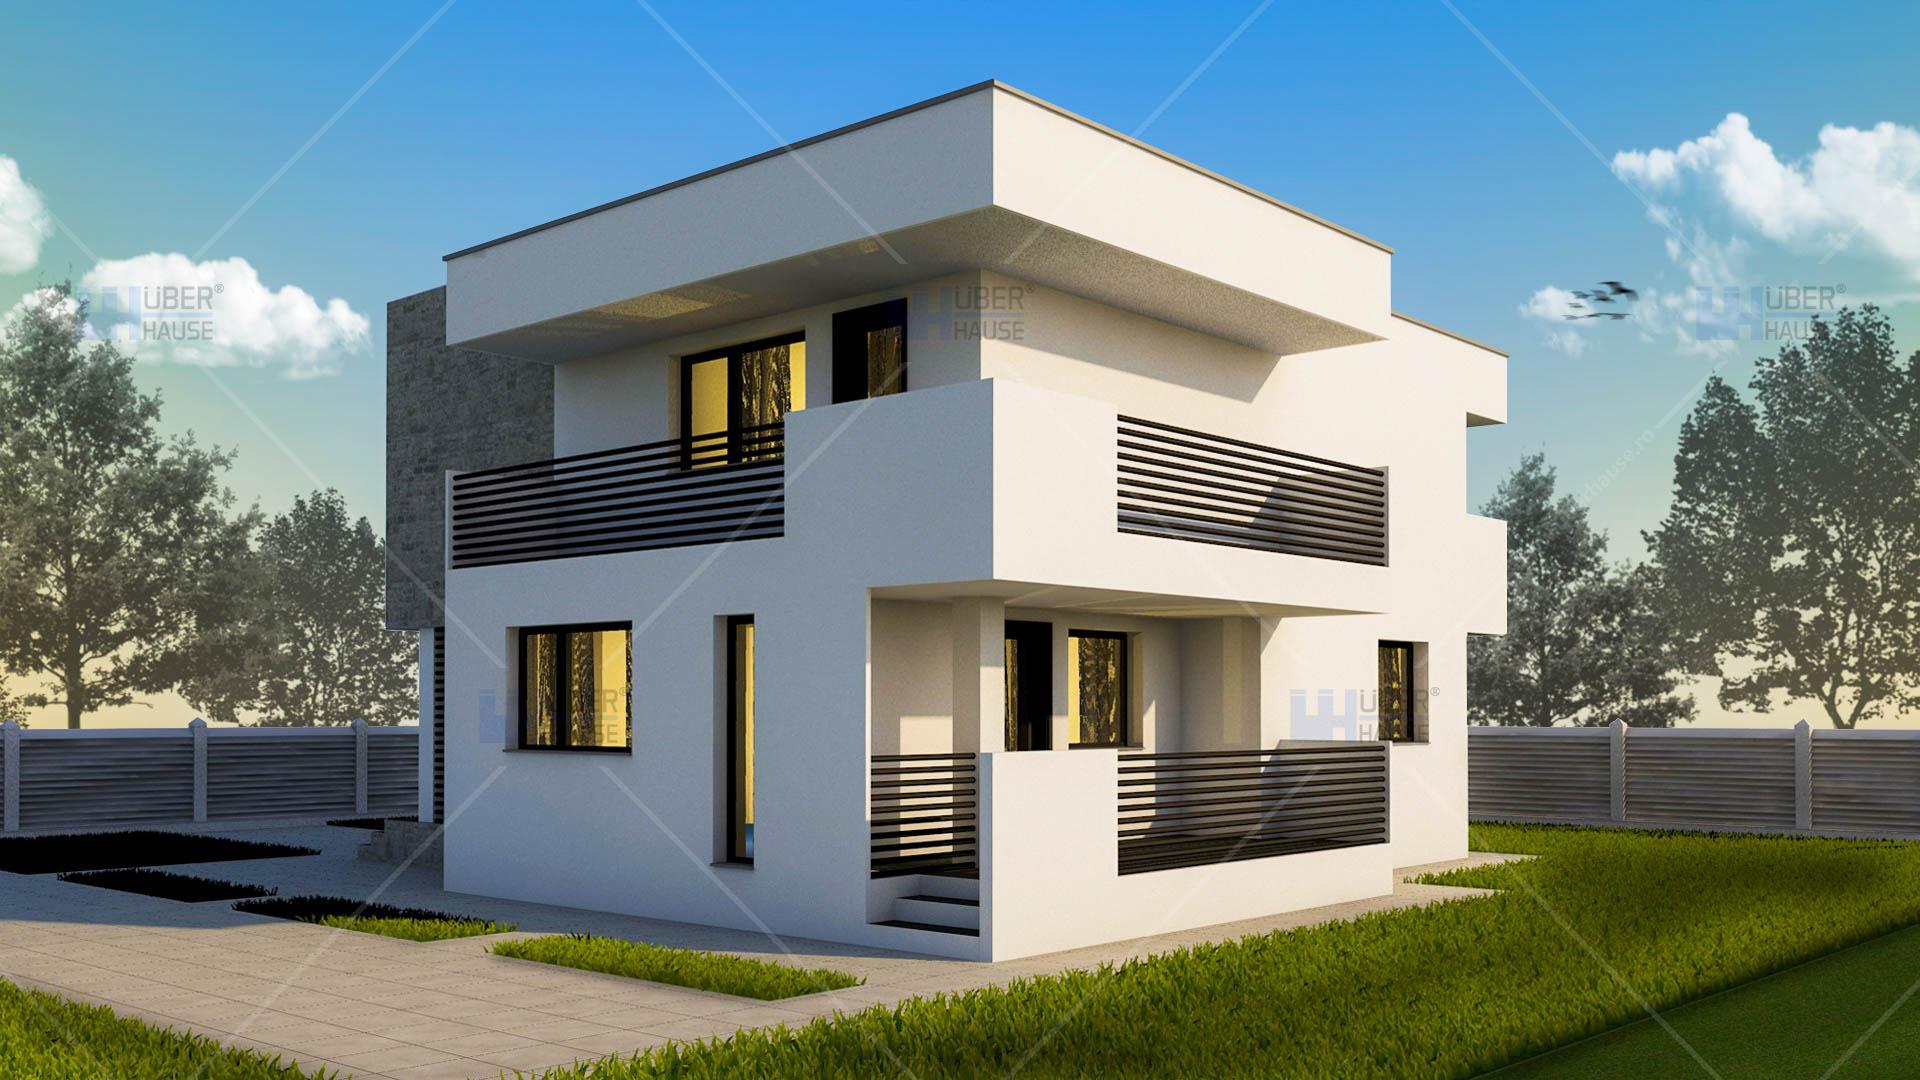 Lucrari proiecte proiect casa cubiqa uberhause poza 3 for Casa moderne